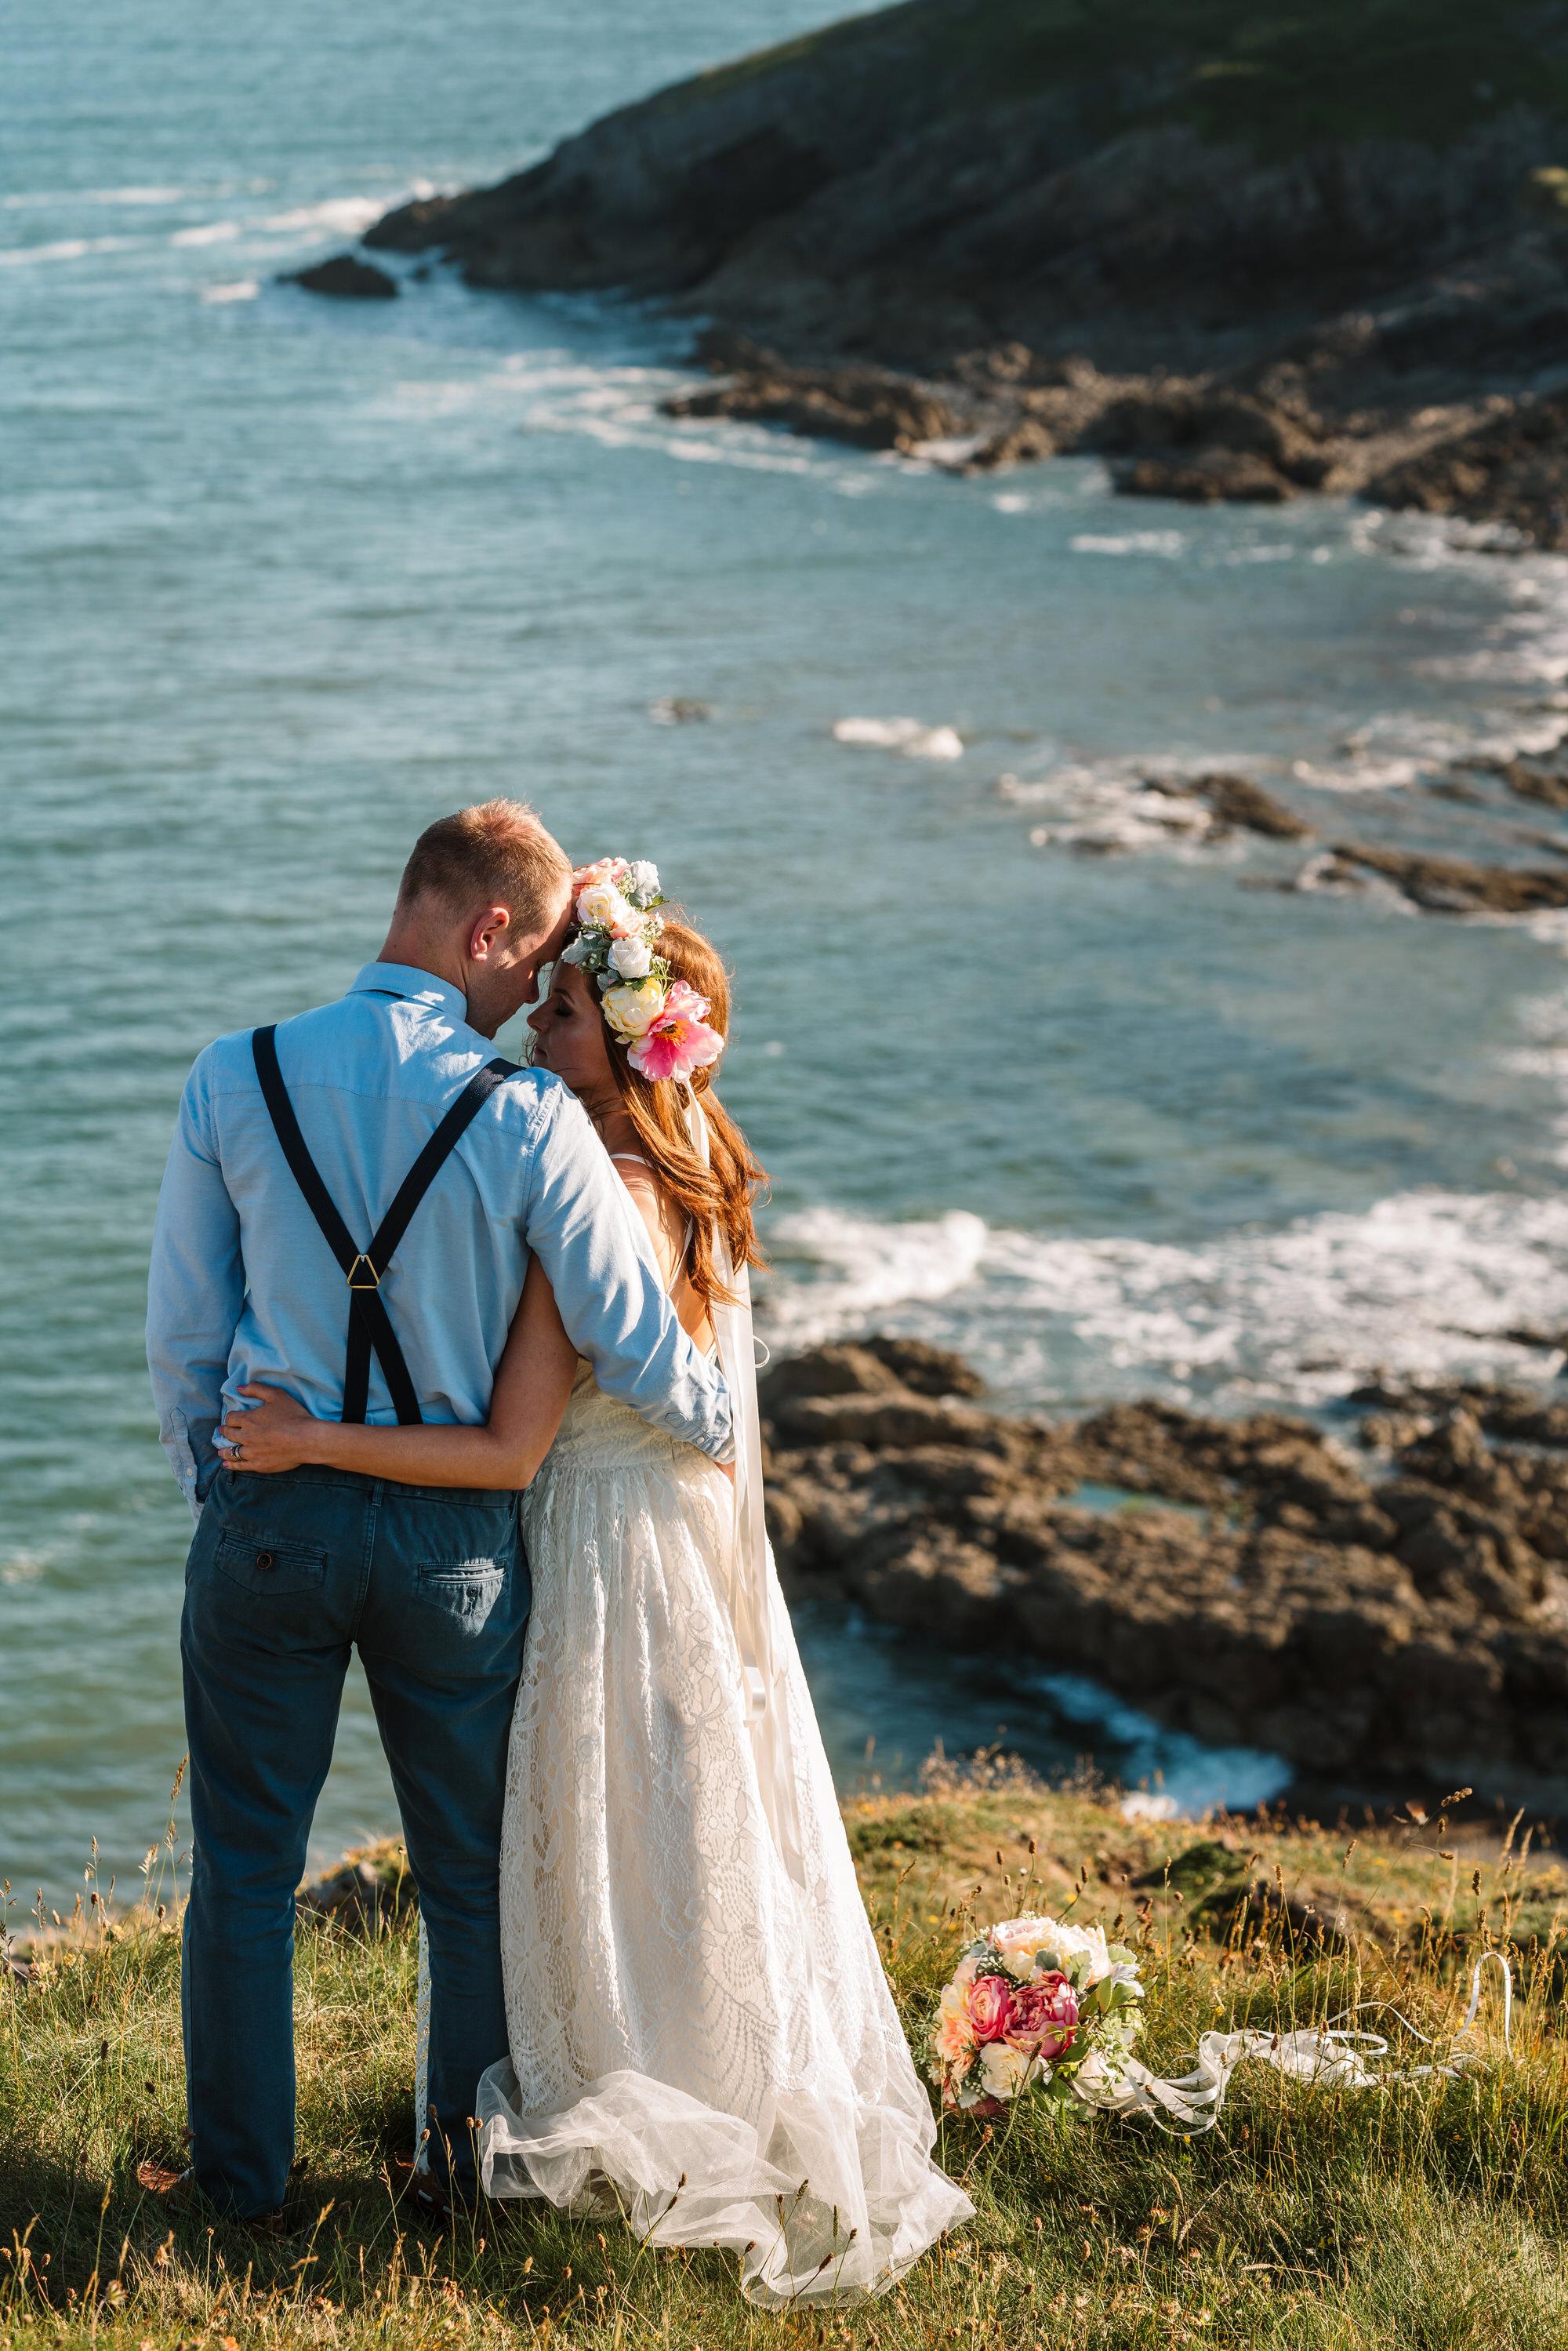 clifftop aventure wedding photo swansea